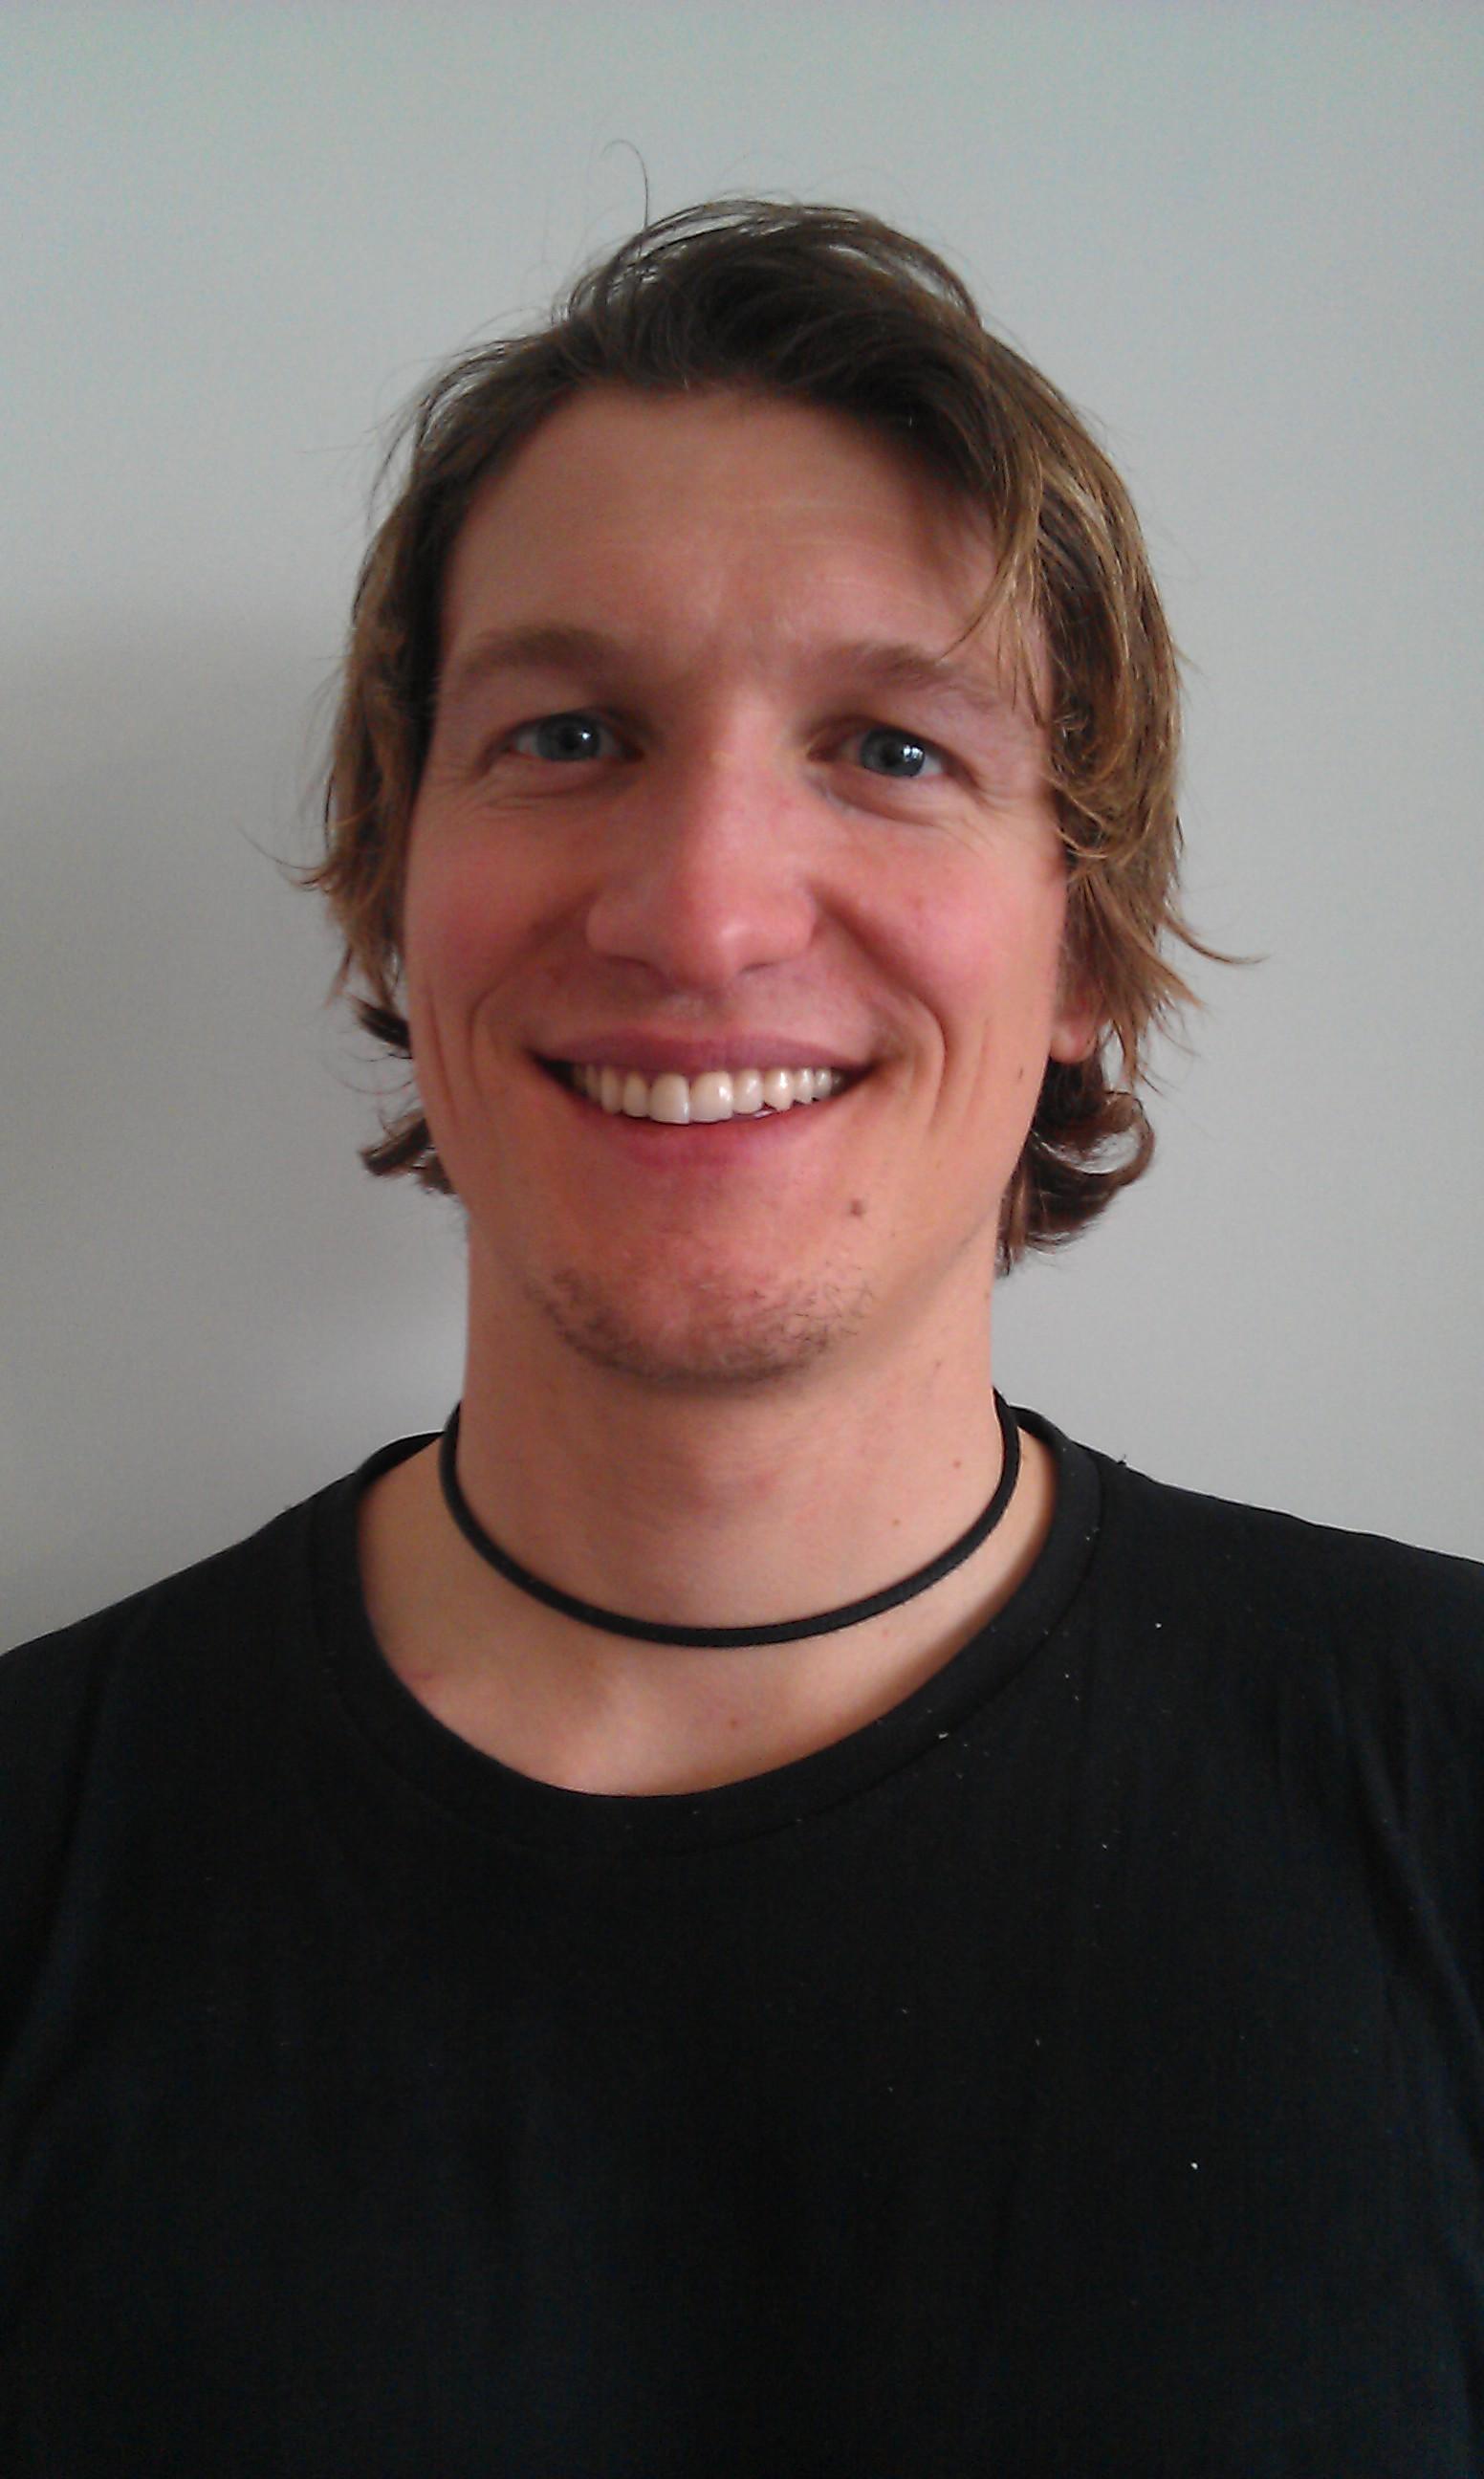 Experte und Autor: Niklaus Jud